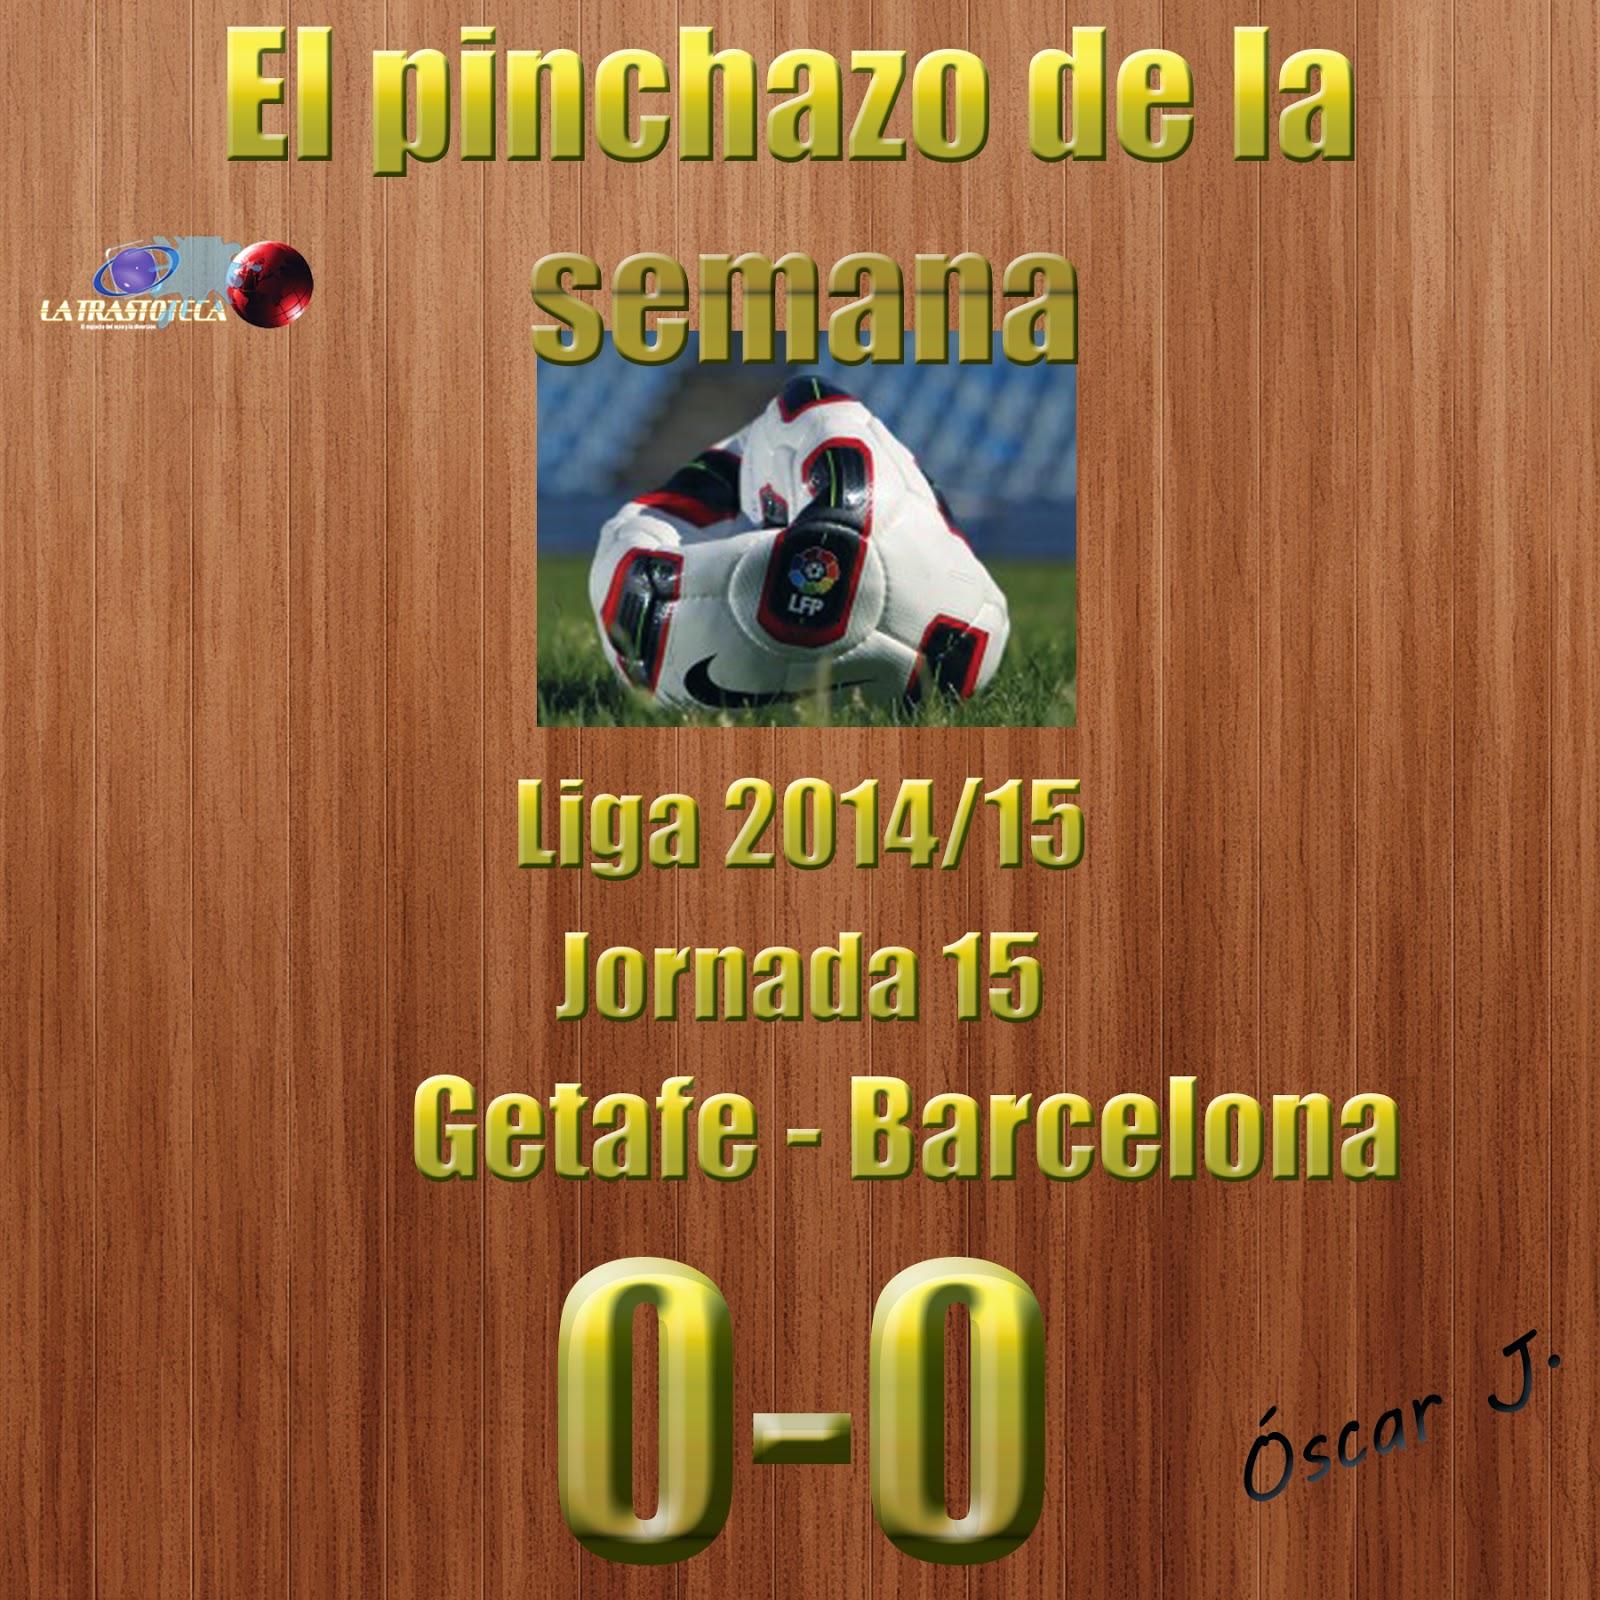 Getafe 0-0 Barcelona. Liga 2014/15 - Jornada 15. El pinchazo de la semana.